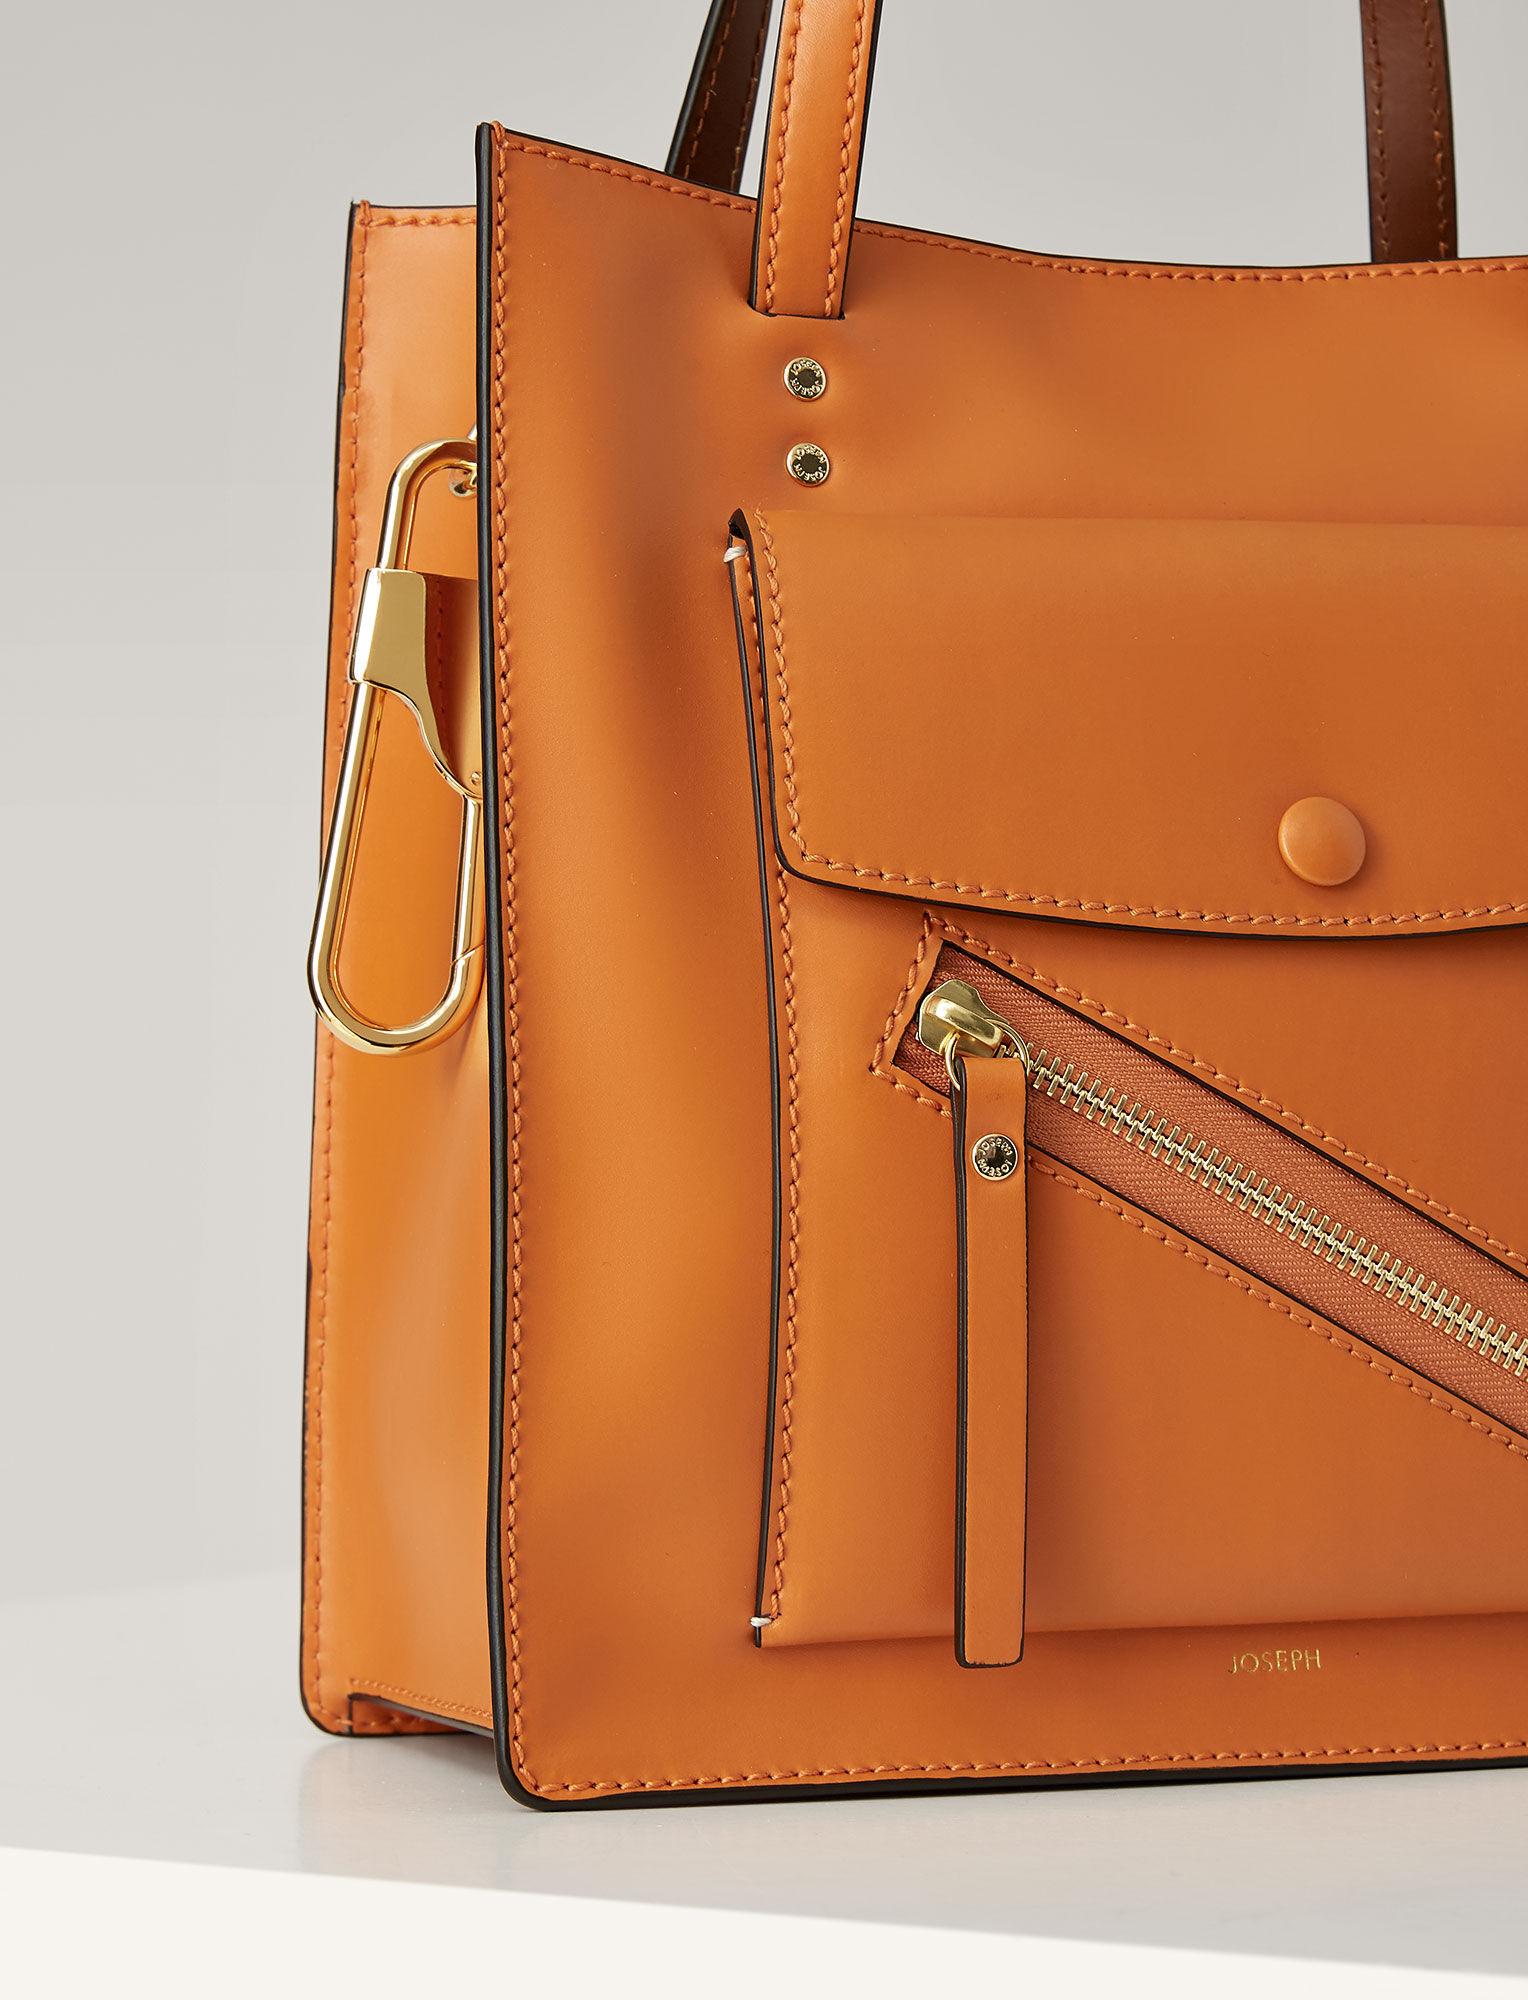 Joseph, Leather Portobello 25 Bag, in ORANGE